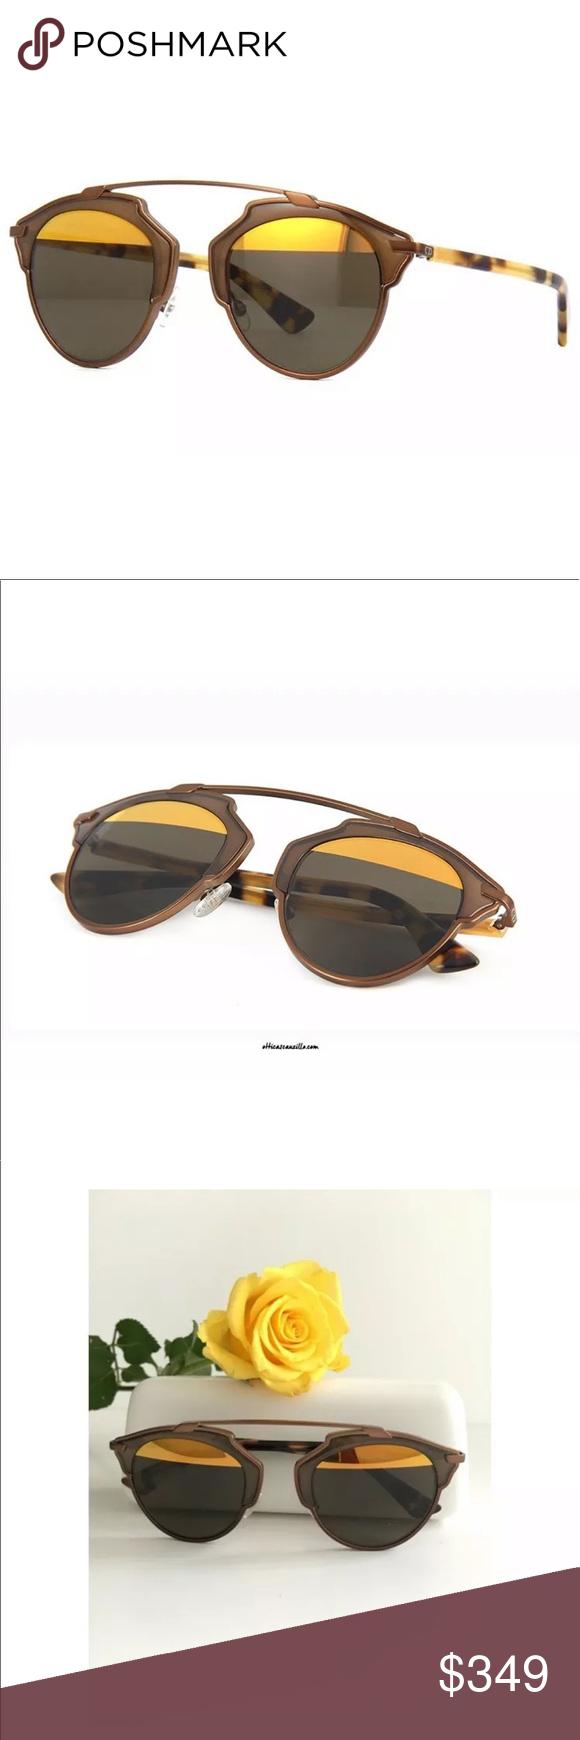 018cb70681 Christian Dior SoReal RJKEB Gold Brown Havana Dior So Real Sunglasses Dior  So Real RJKEB brown